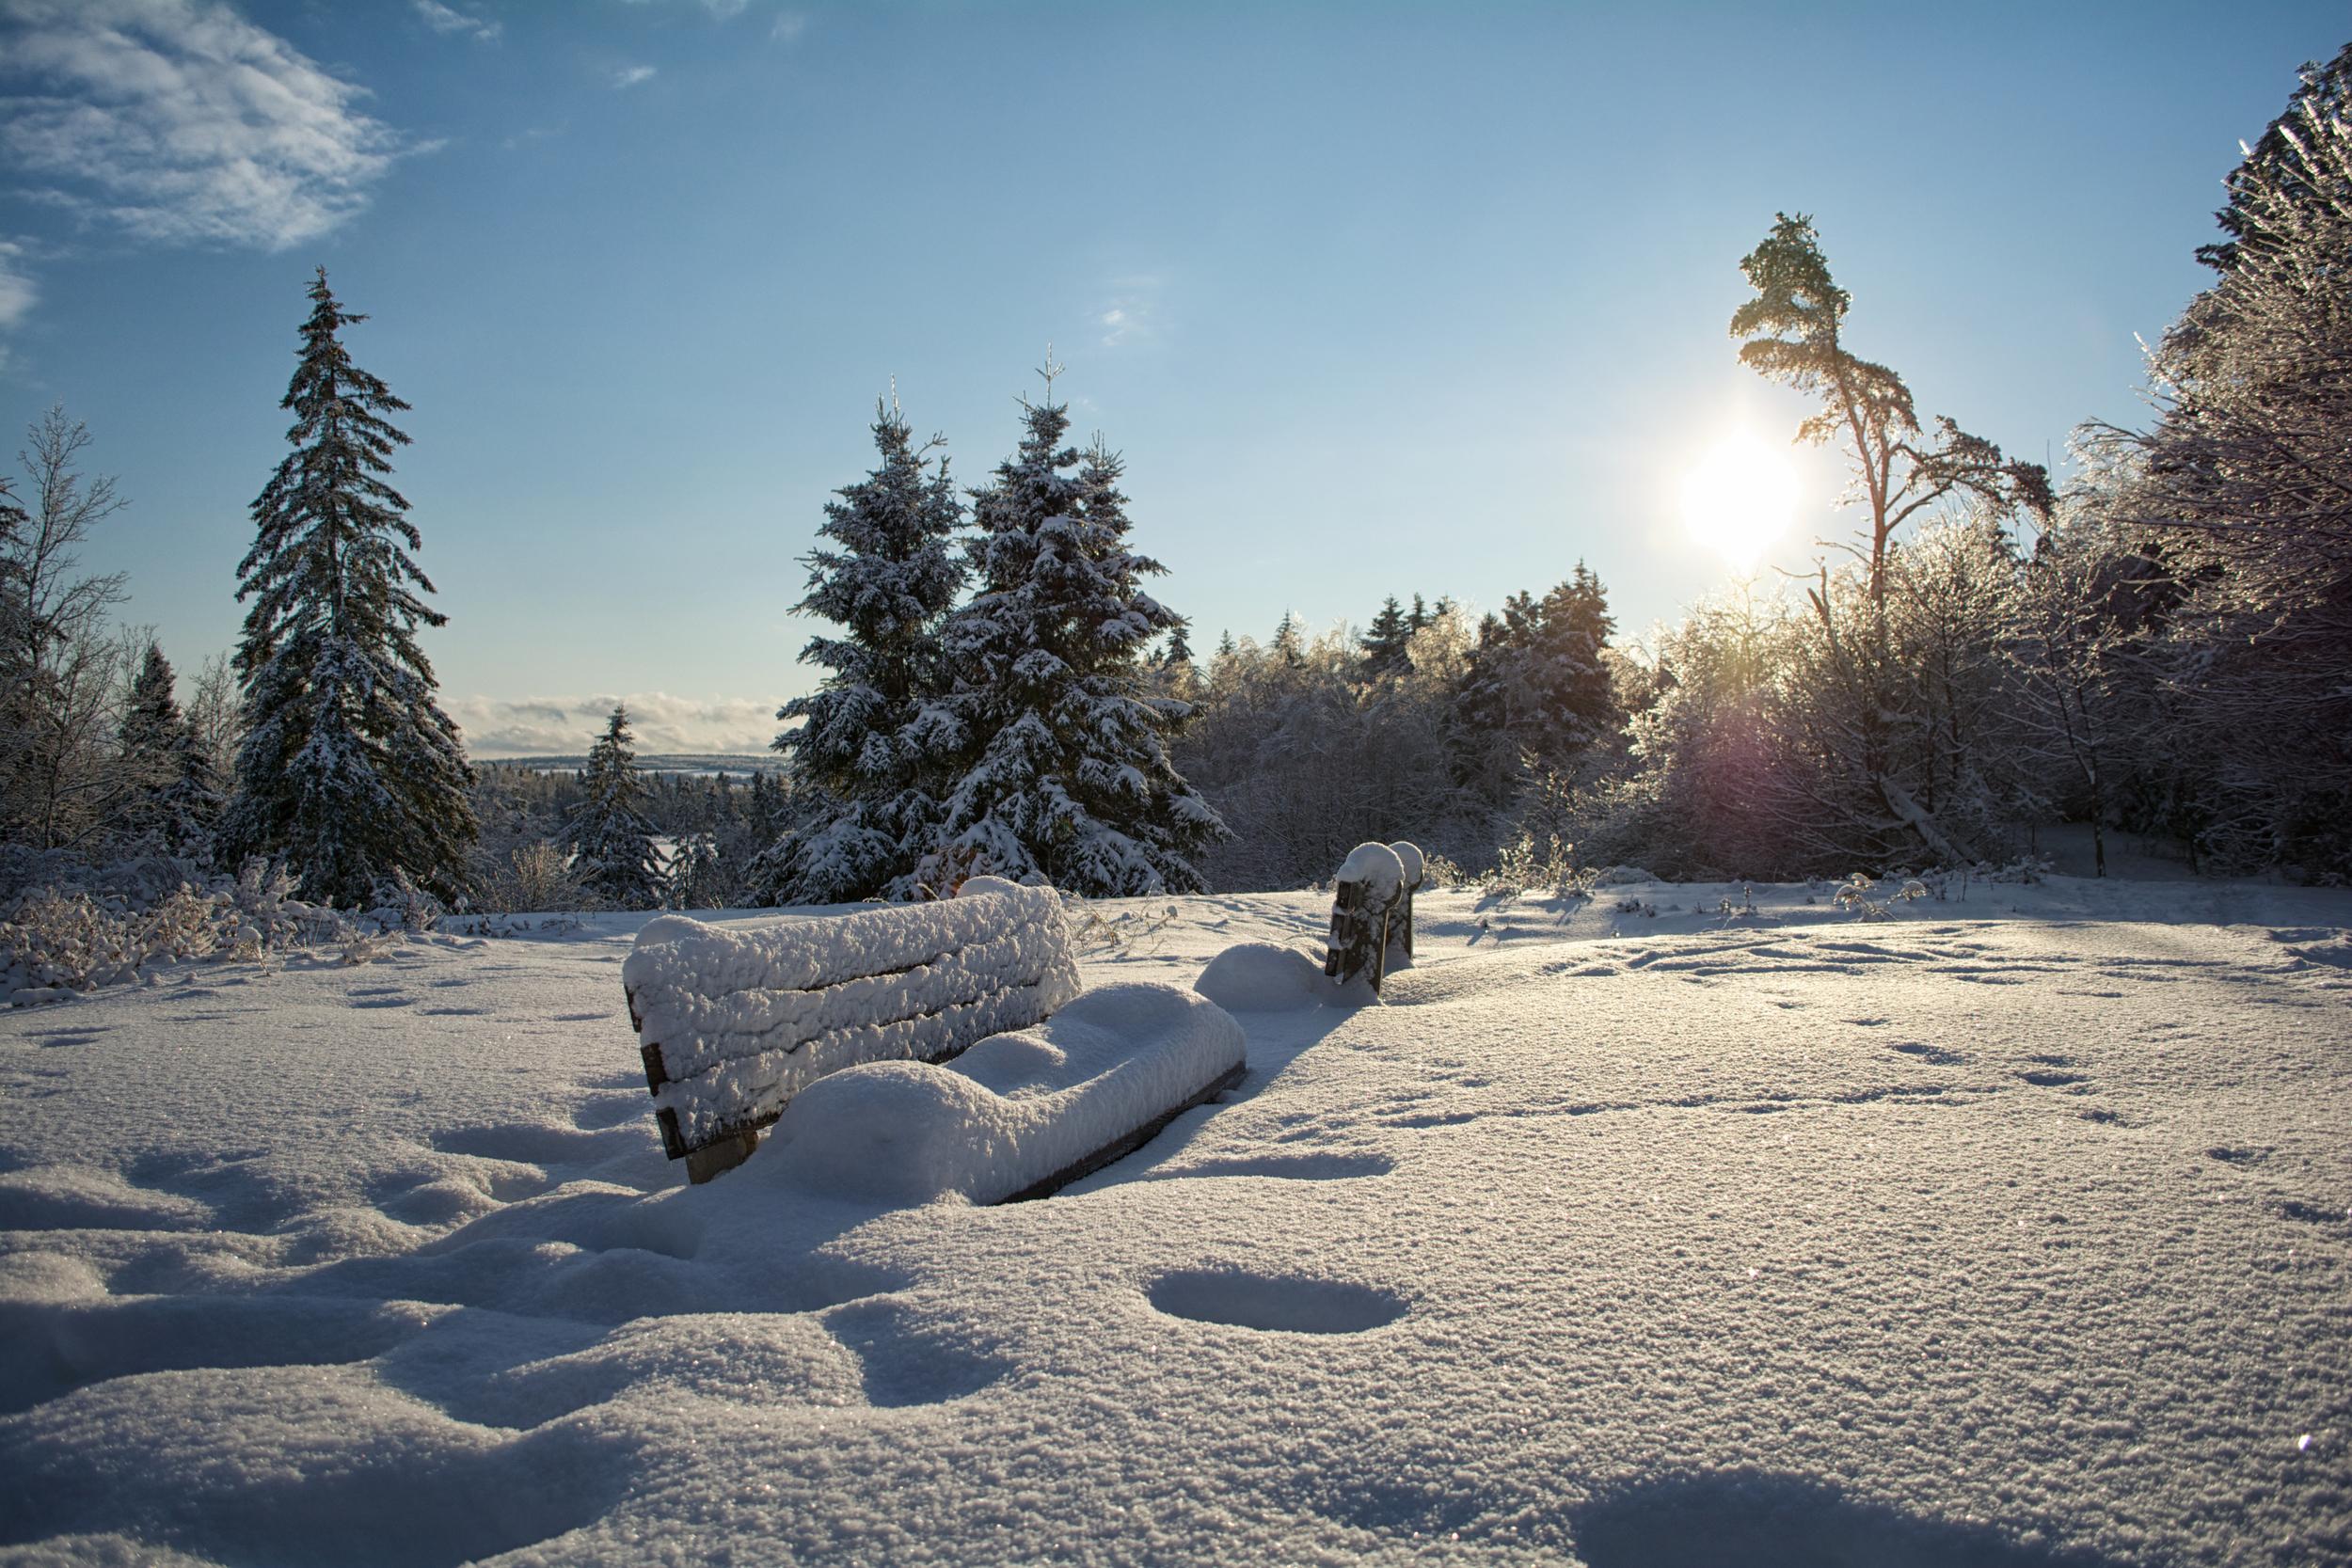 Benches under snow